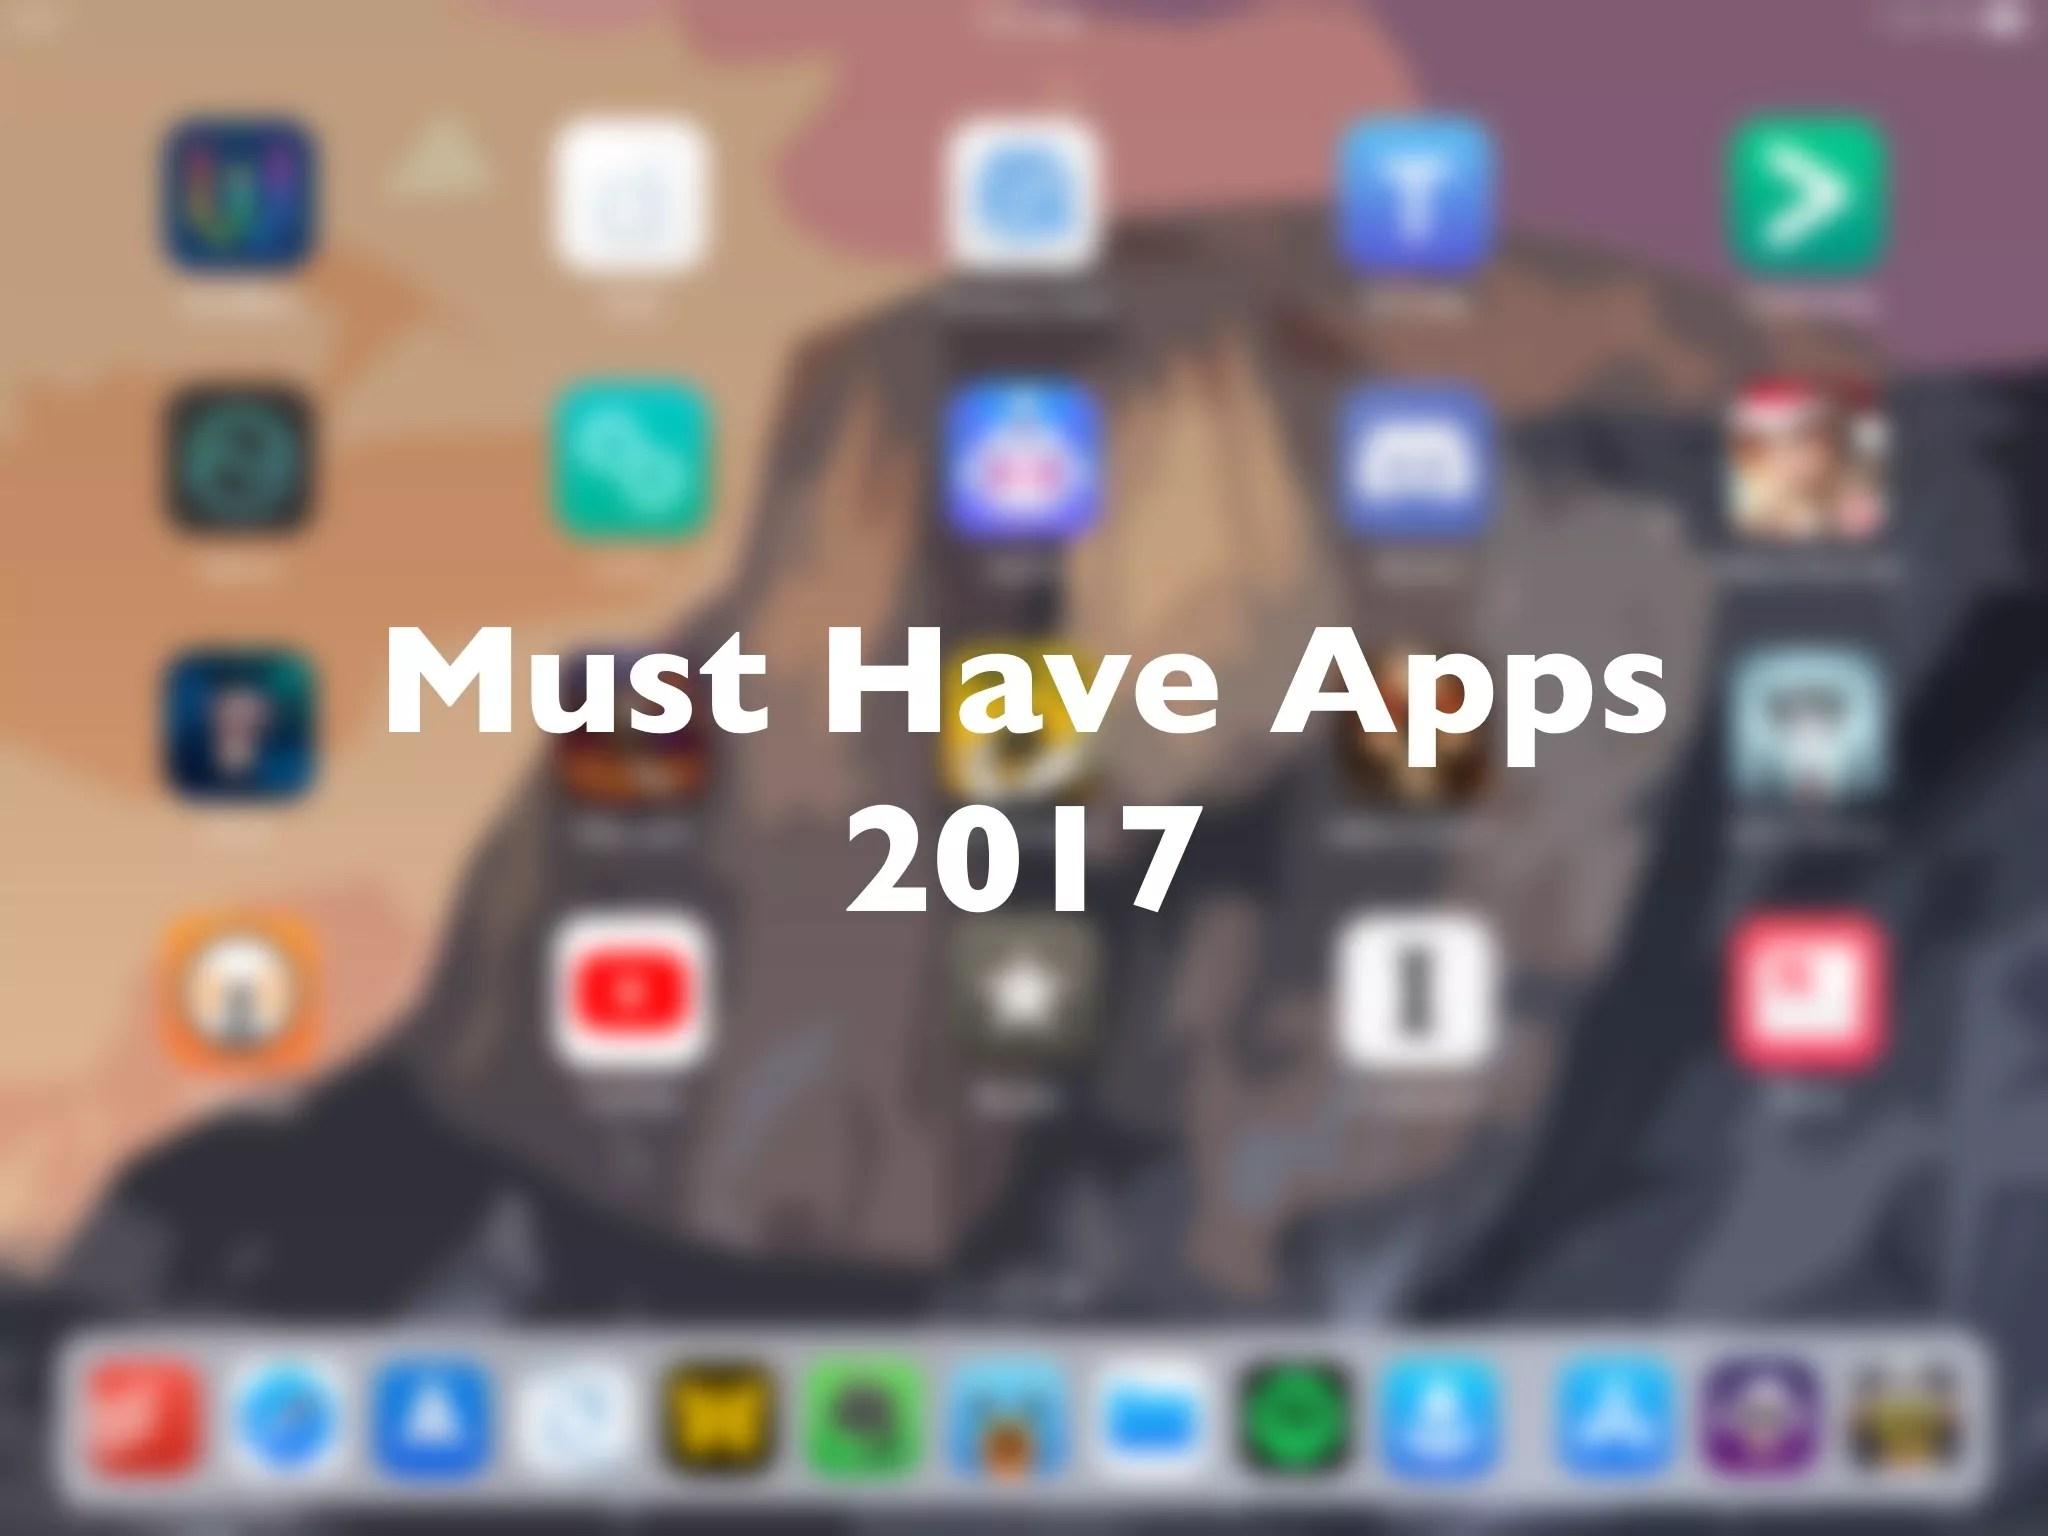 dating advice reddit app 2017 iphone wallpaper